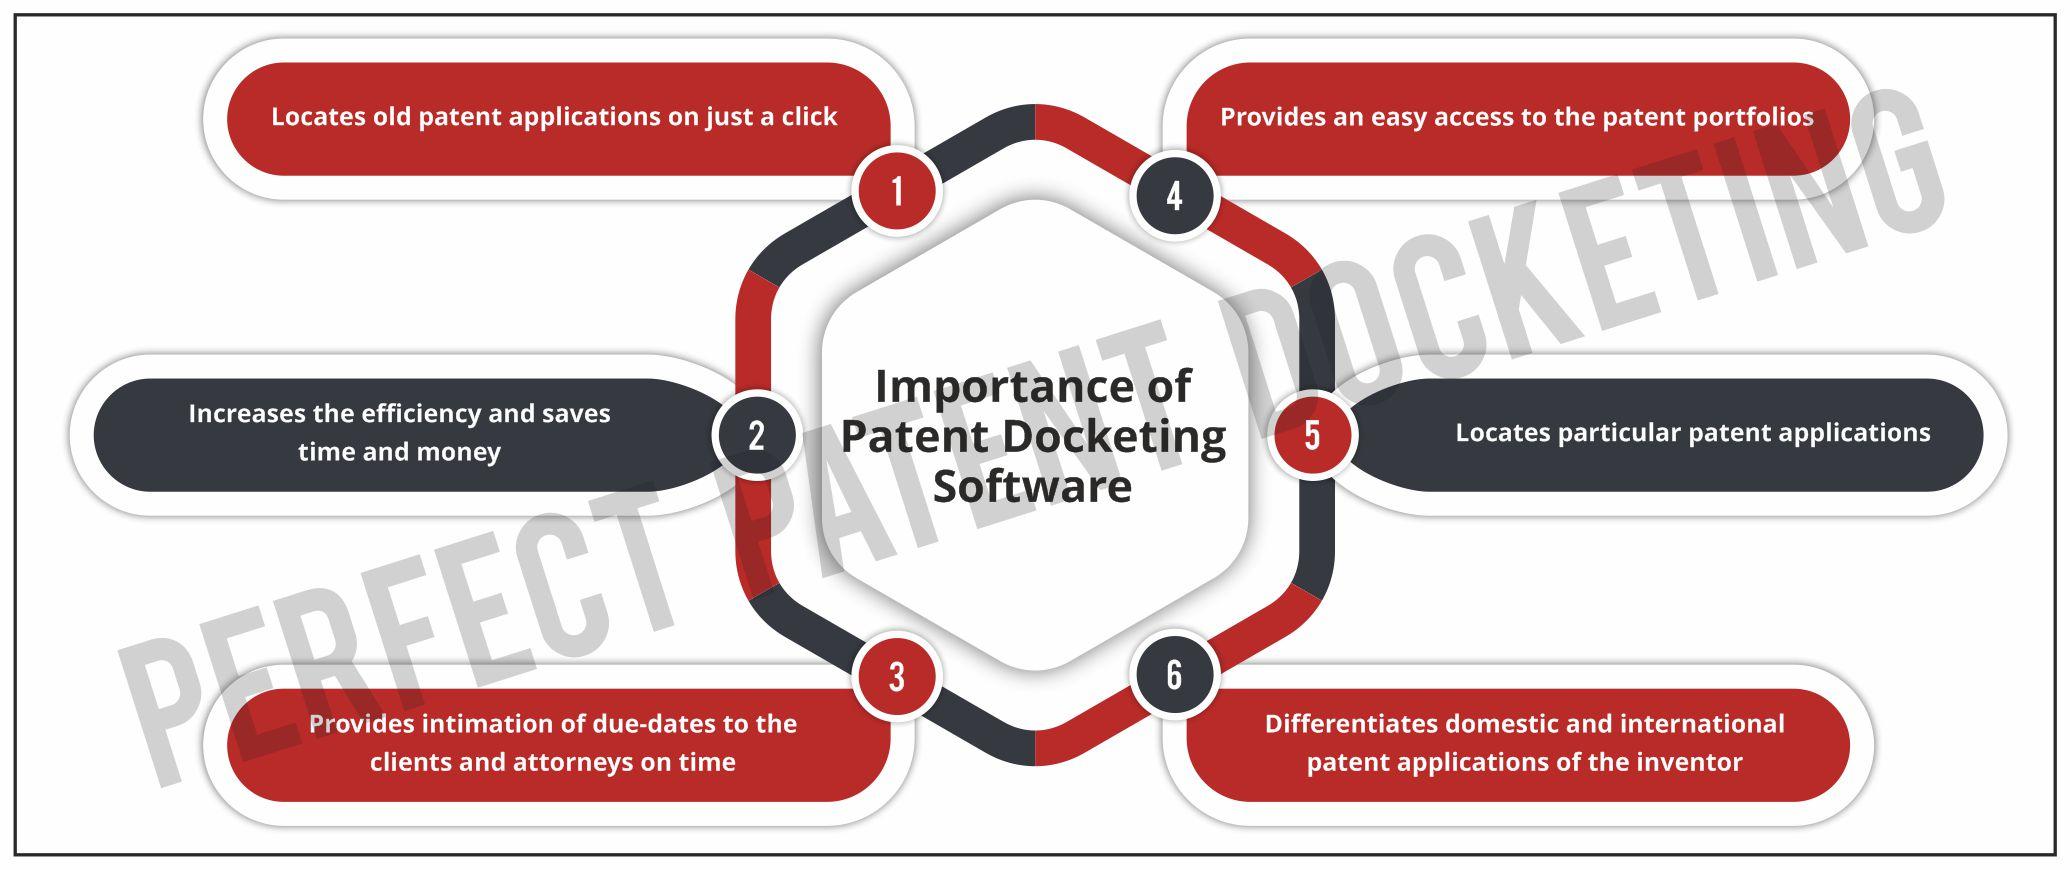 Patent Docketing Software - Its Importance